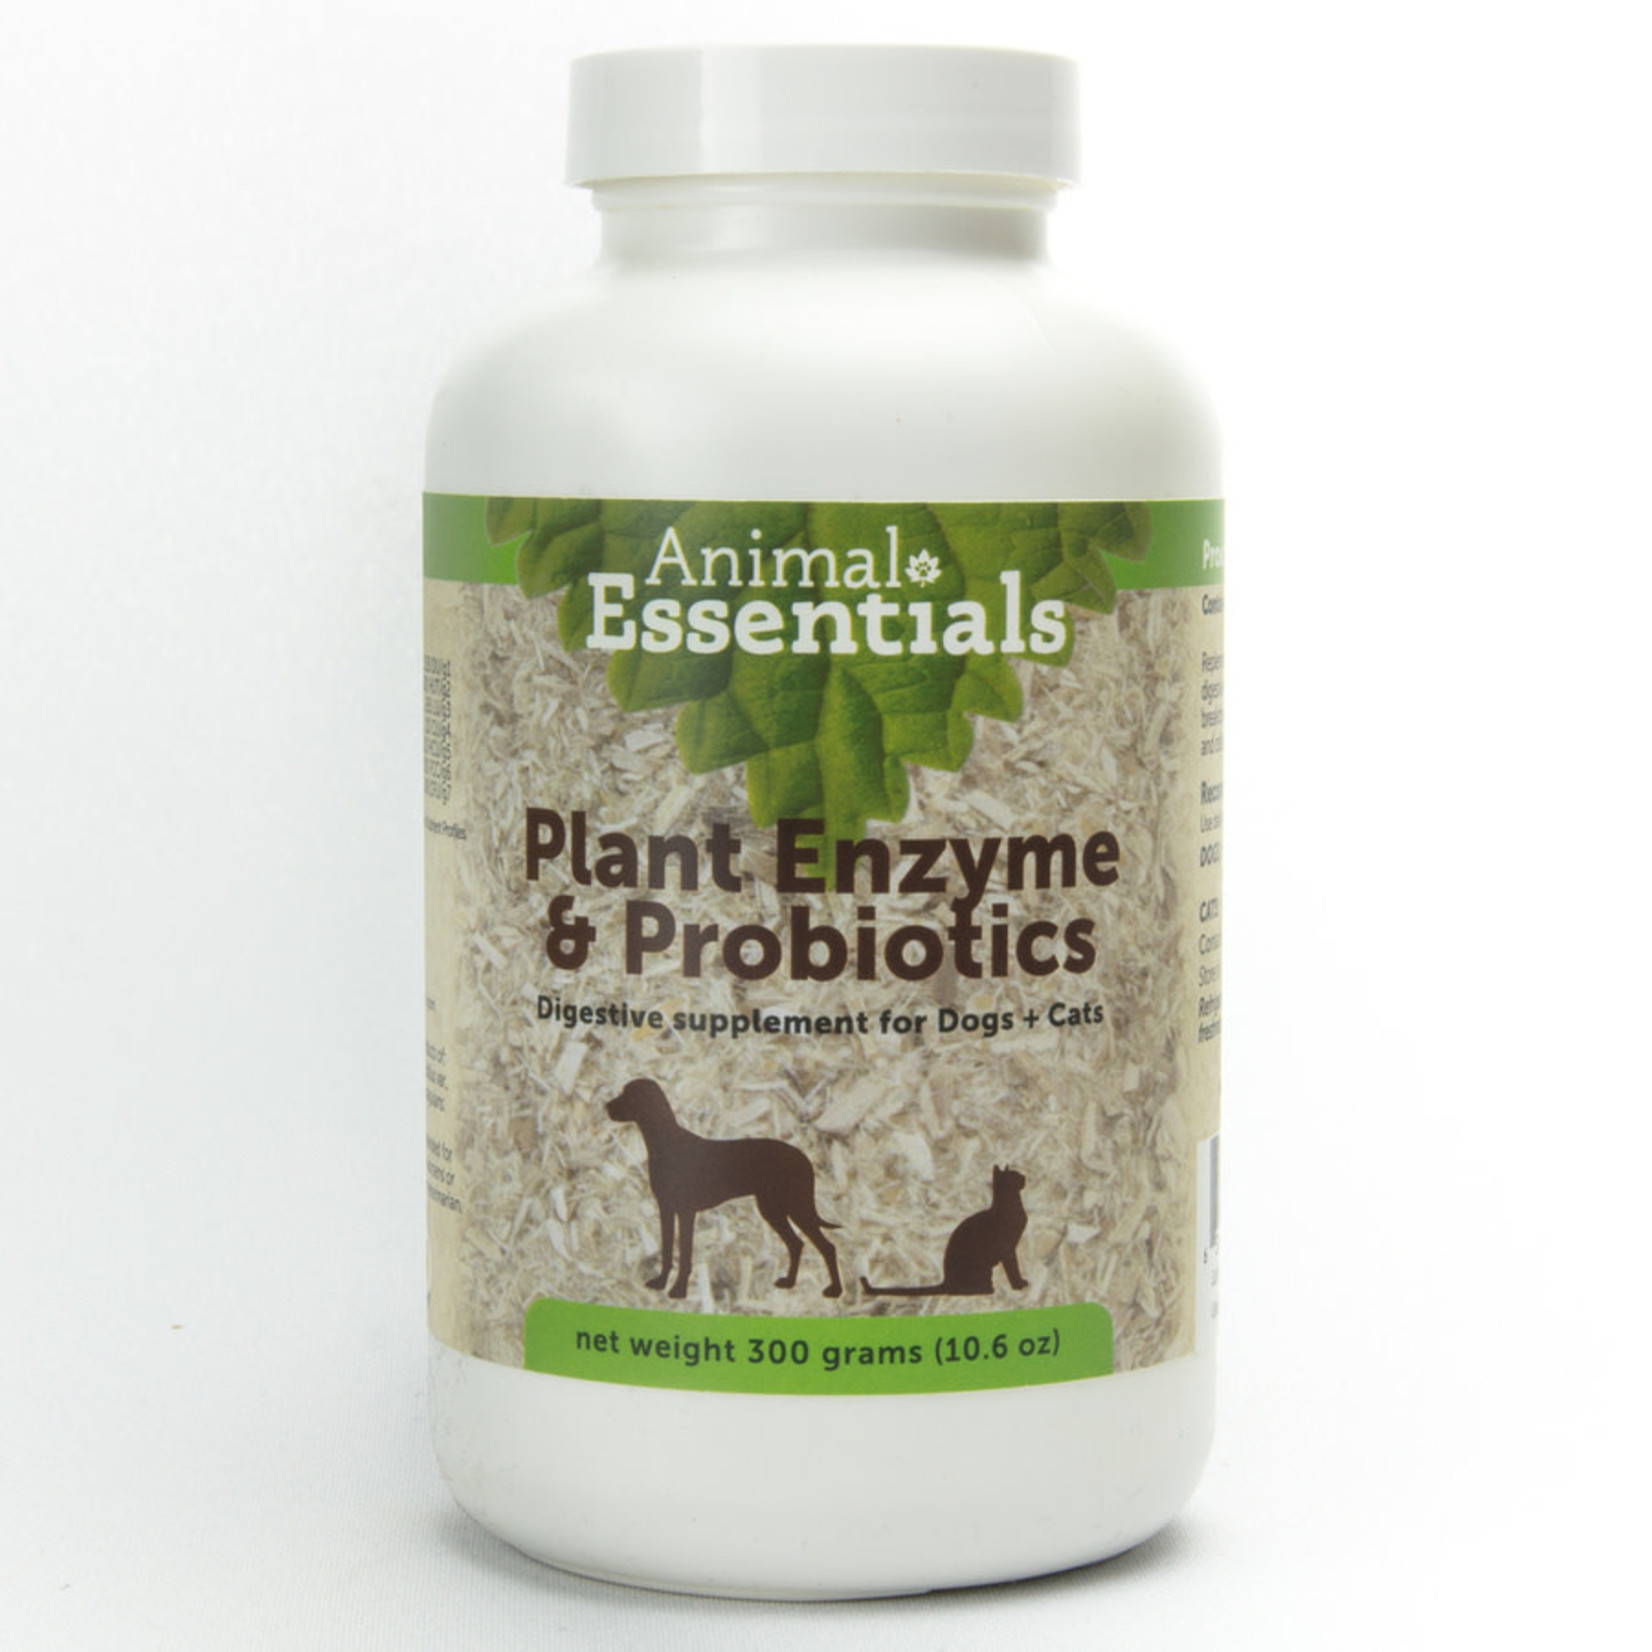 Animal Essentials Animal Essentials Plant Enzyme & Probiotics 100 gm